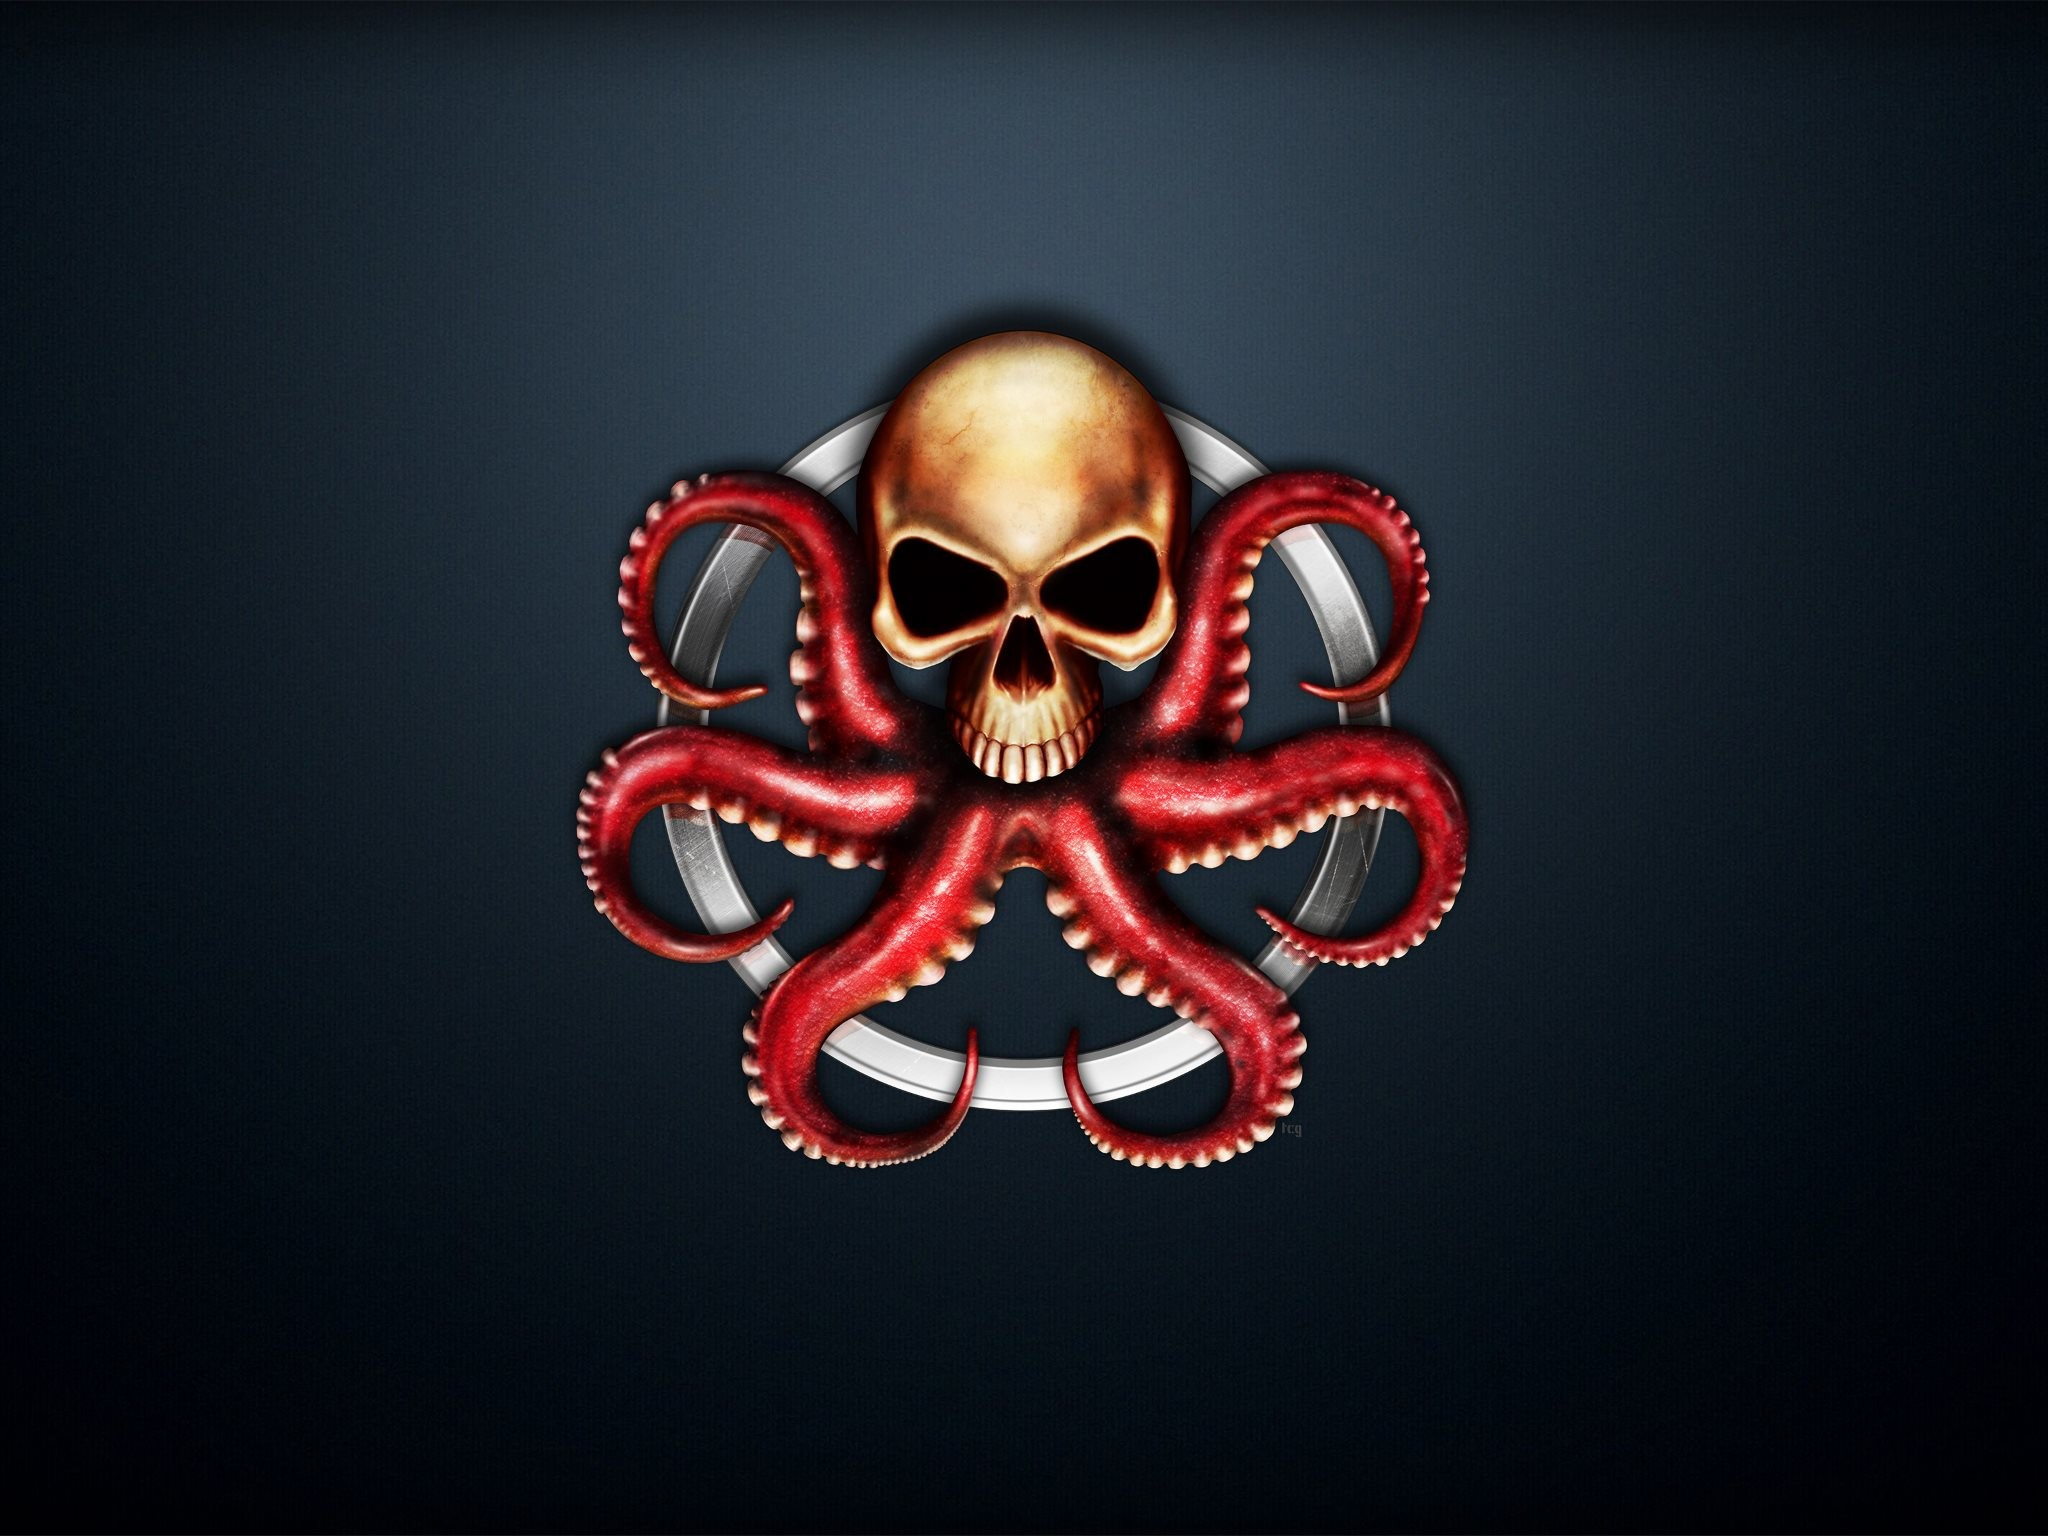 4K HD Wallpaper: Hydra Logo from Marvel Comics